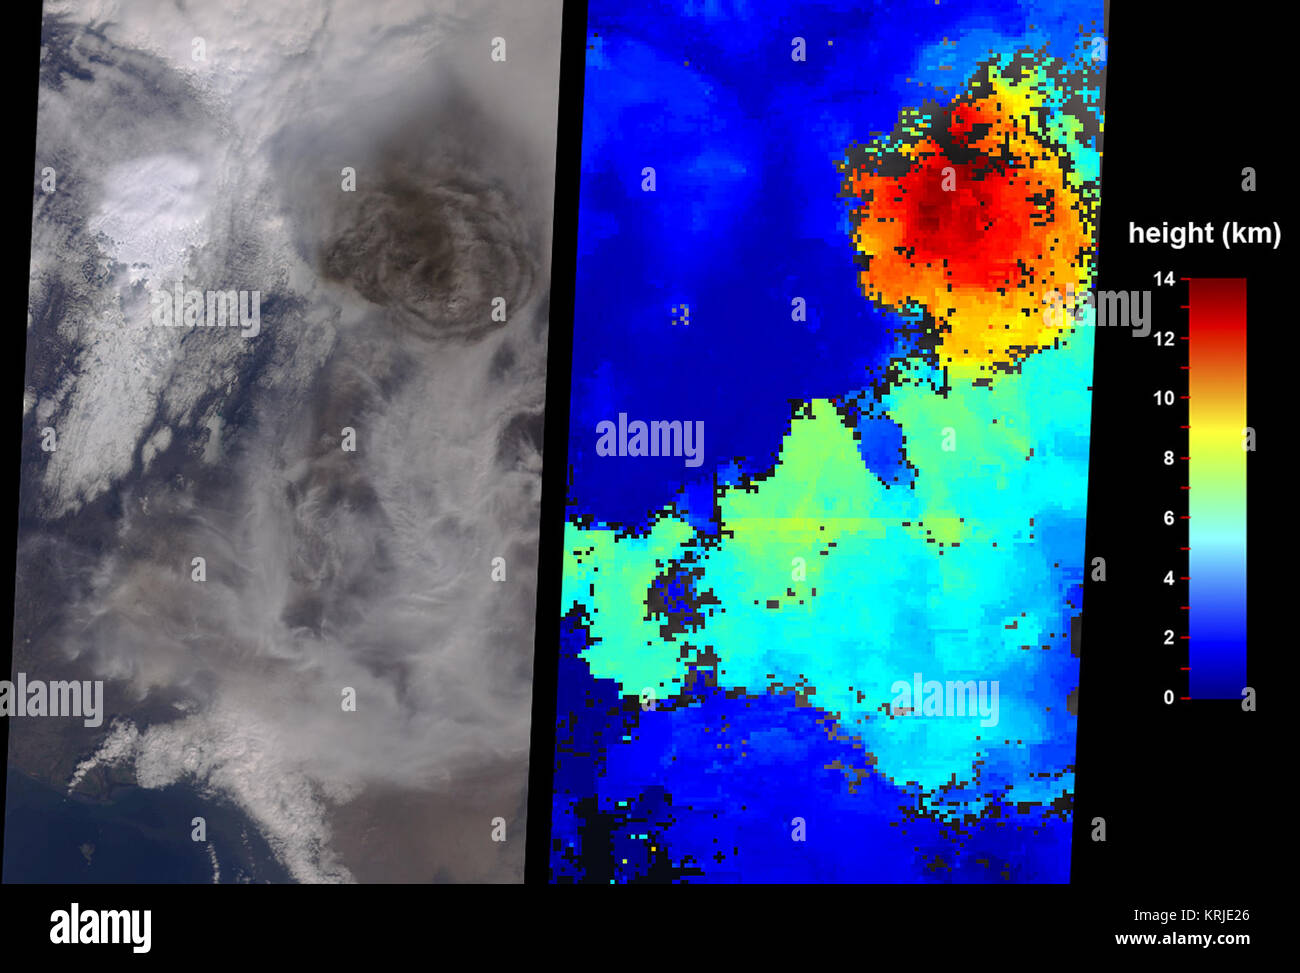 IDL TIFF file Grímsvötn Volcano Injects Ash into the Stratosphere, 05-22-2011 - Stock Image